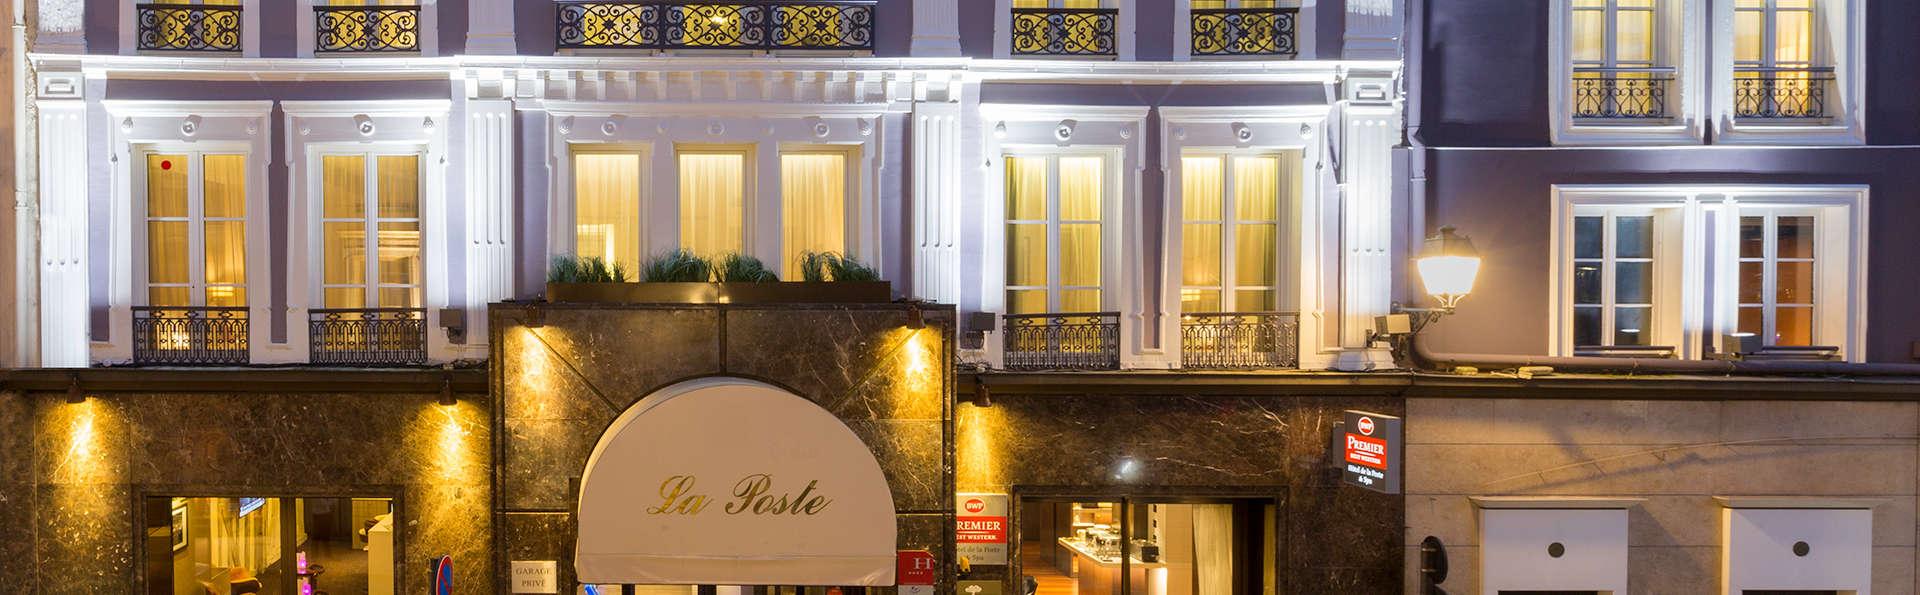 Best Western Premier Hôtel de la Poste & Spa - EDIT_NEW_FRONT.jpg